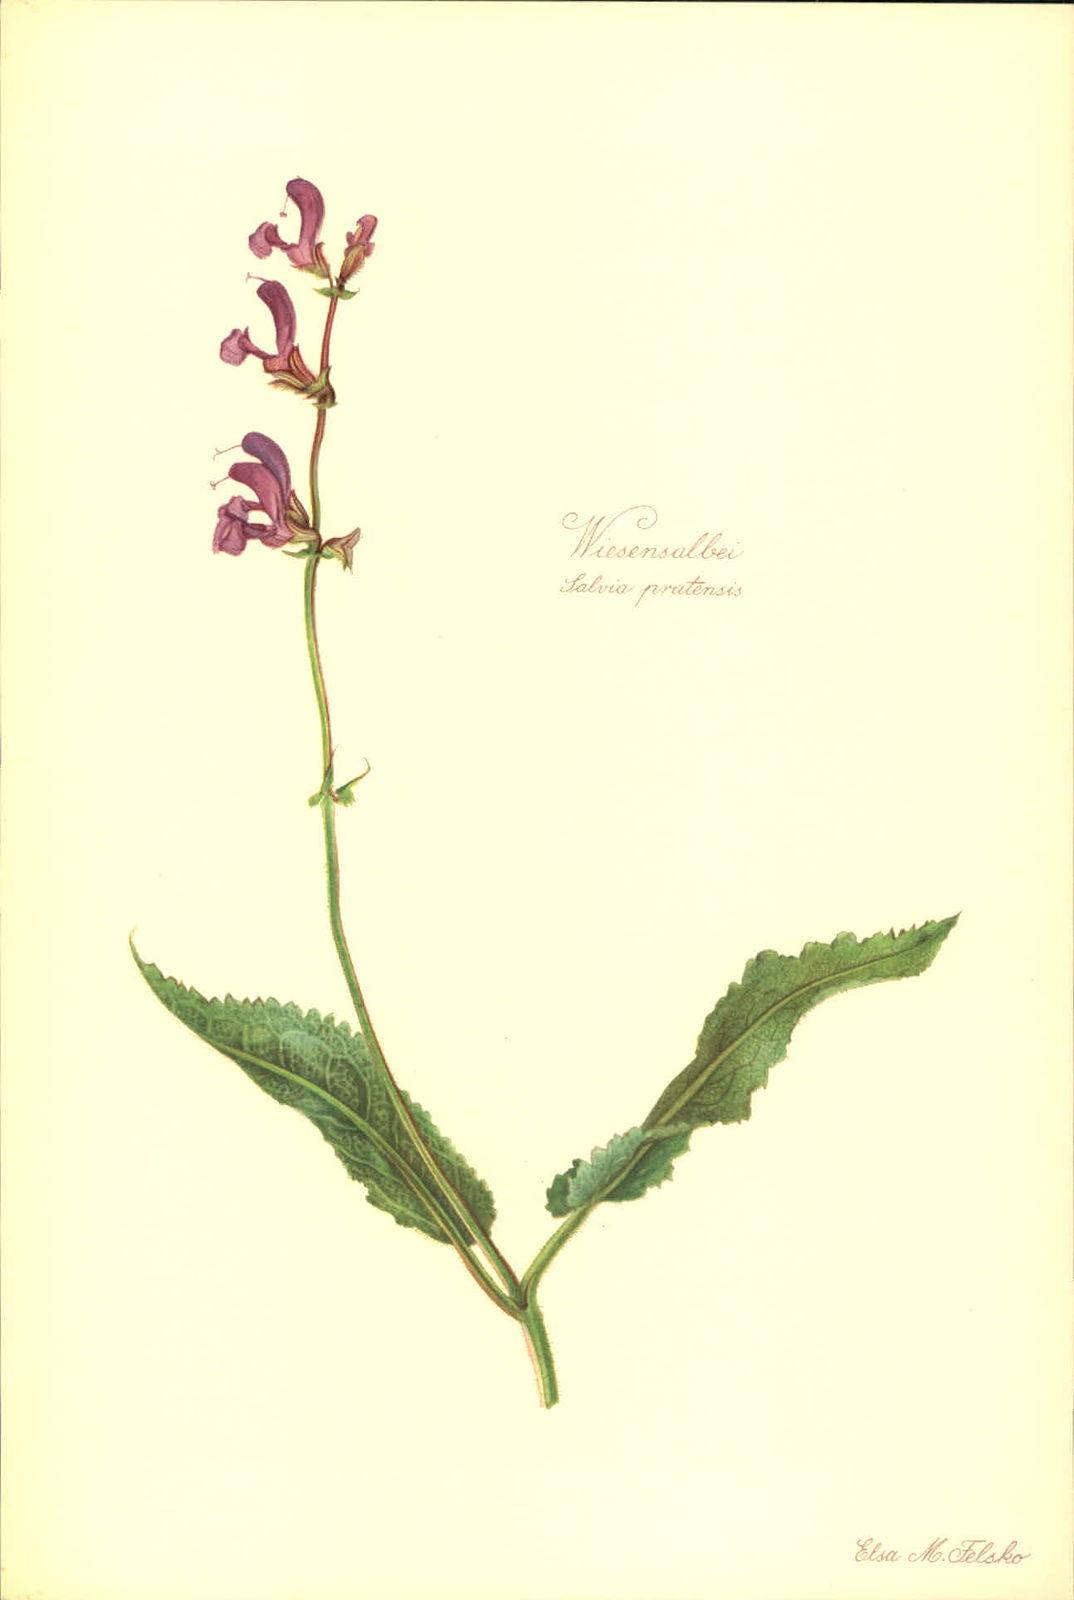 Wiesensalbei (Salvia pratensis). Kunstdruck nach Aquarell von Elsa M. Felsko.